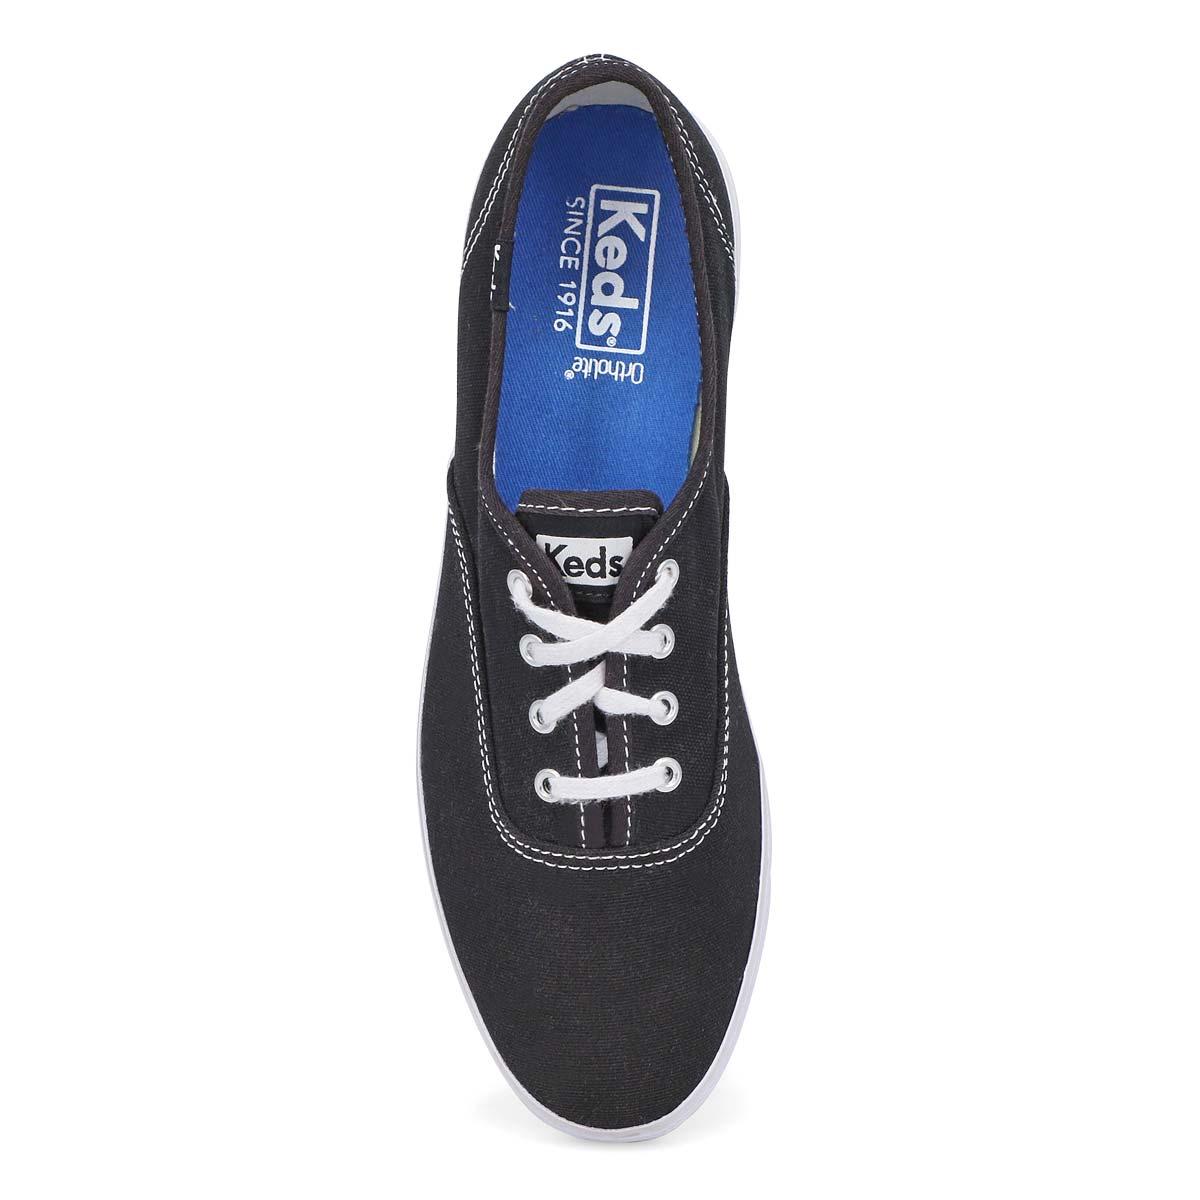 Lds Champion black canvas CVO sneaker